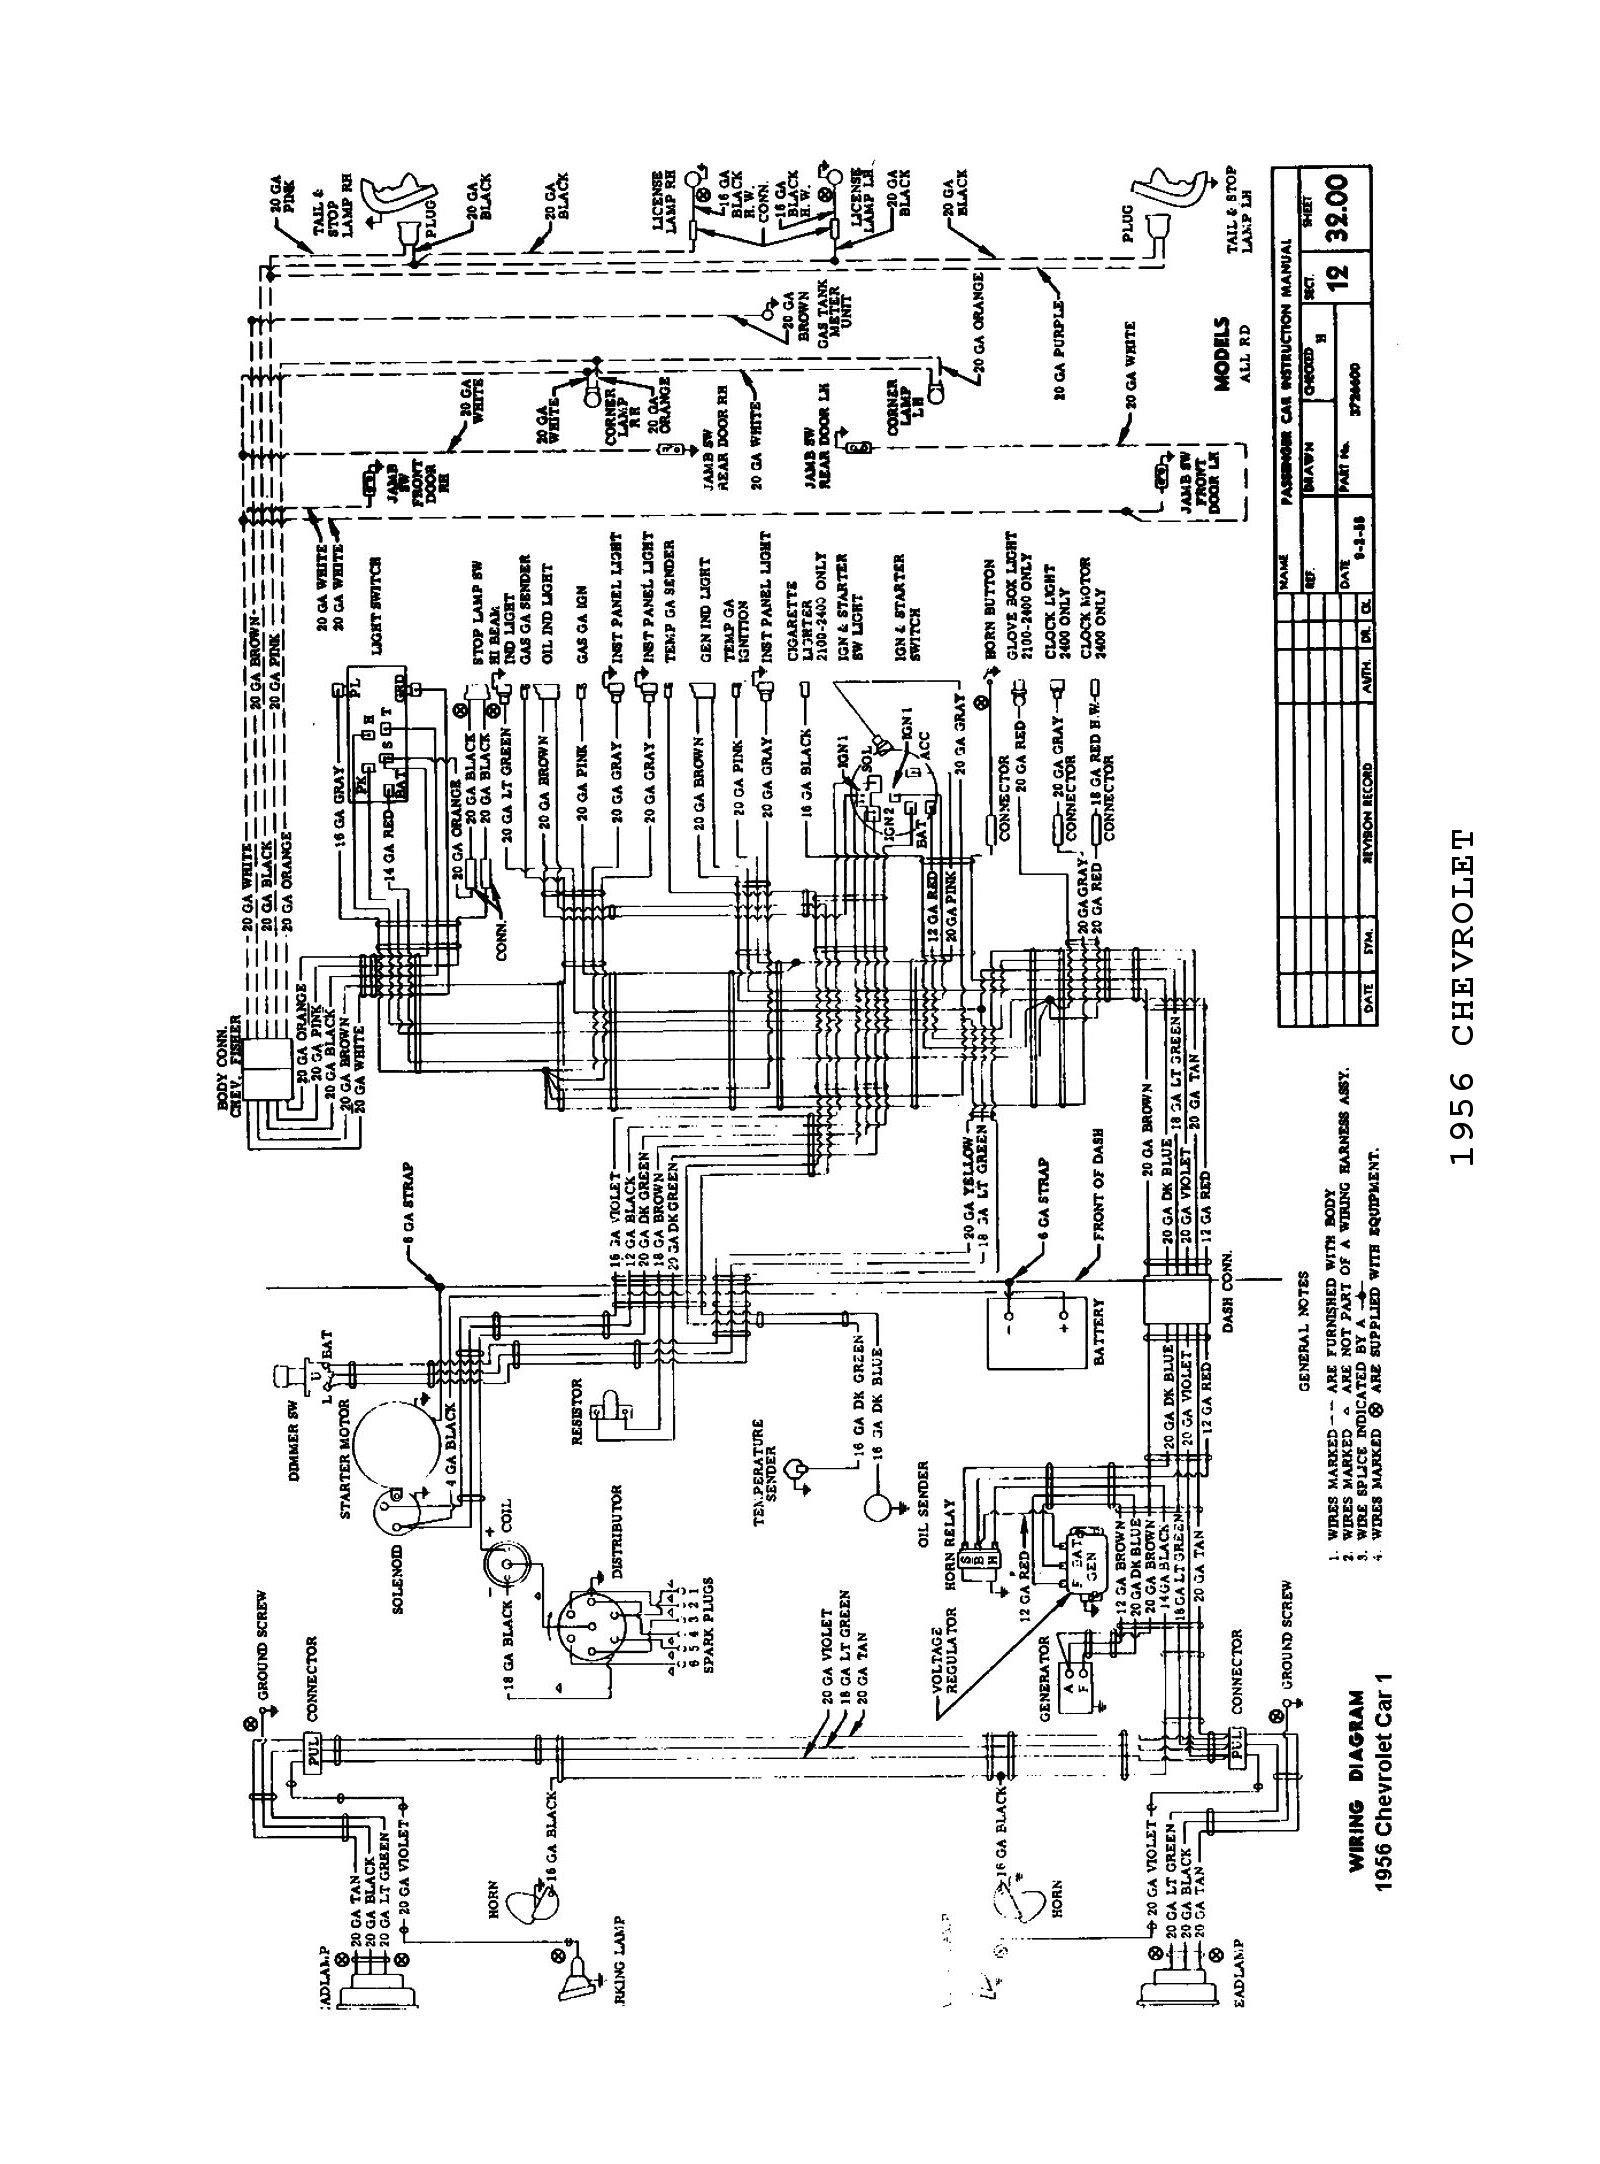 1957 chevrolet fuse box image 5